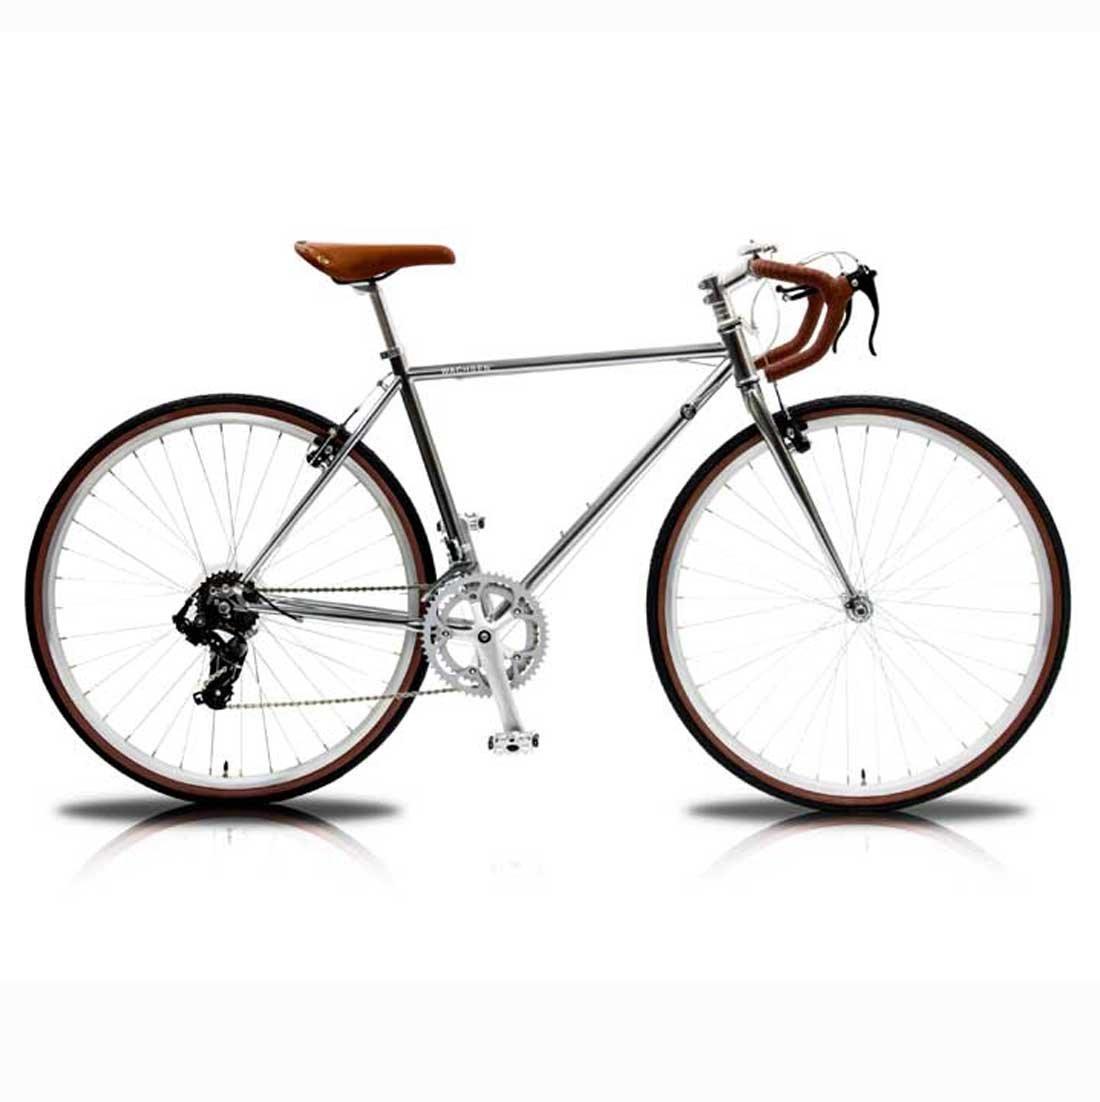 【WACHSEN ロードバイク】WBR-7001SPARK スパーク湘南鵠沼海岸発信 B078JJ5VQPシルバー